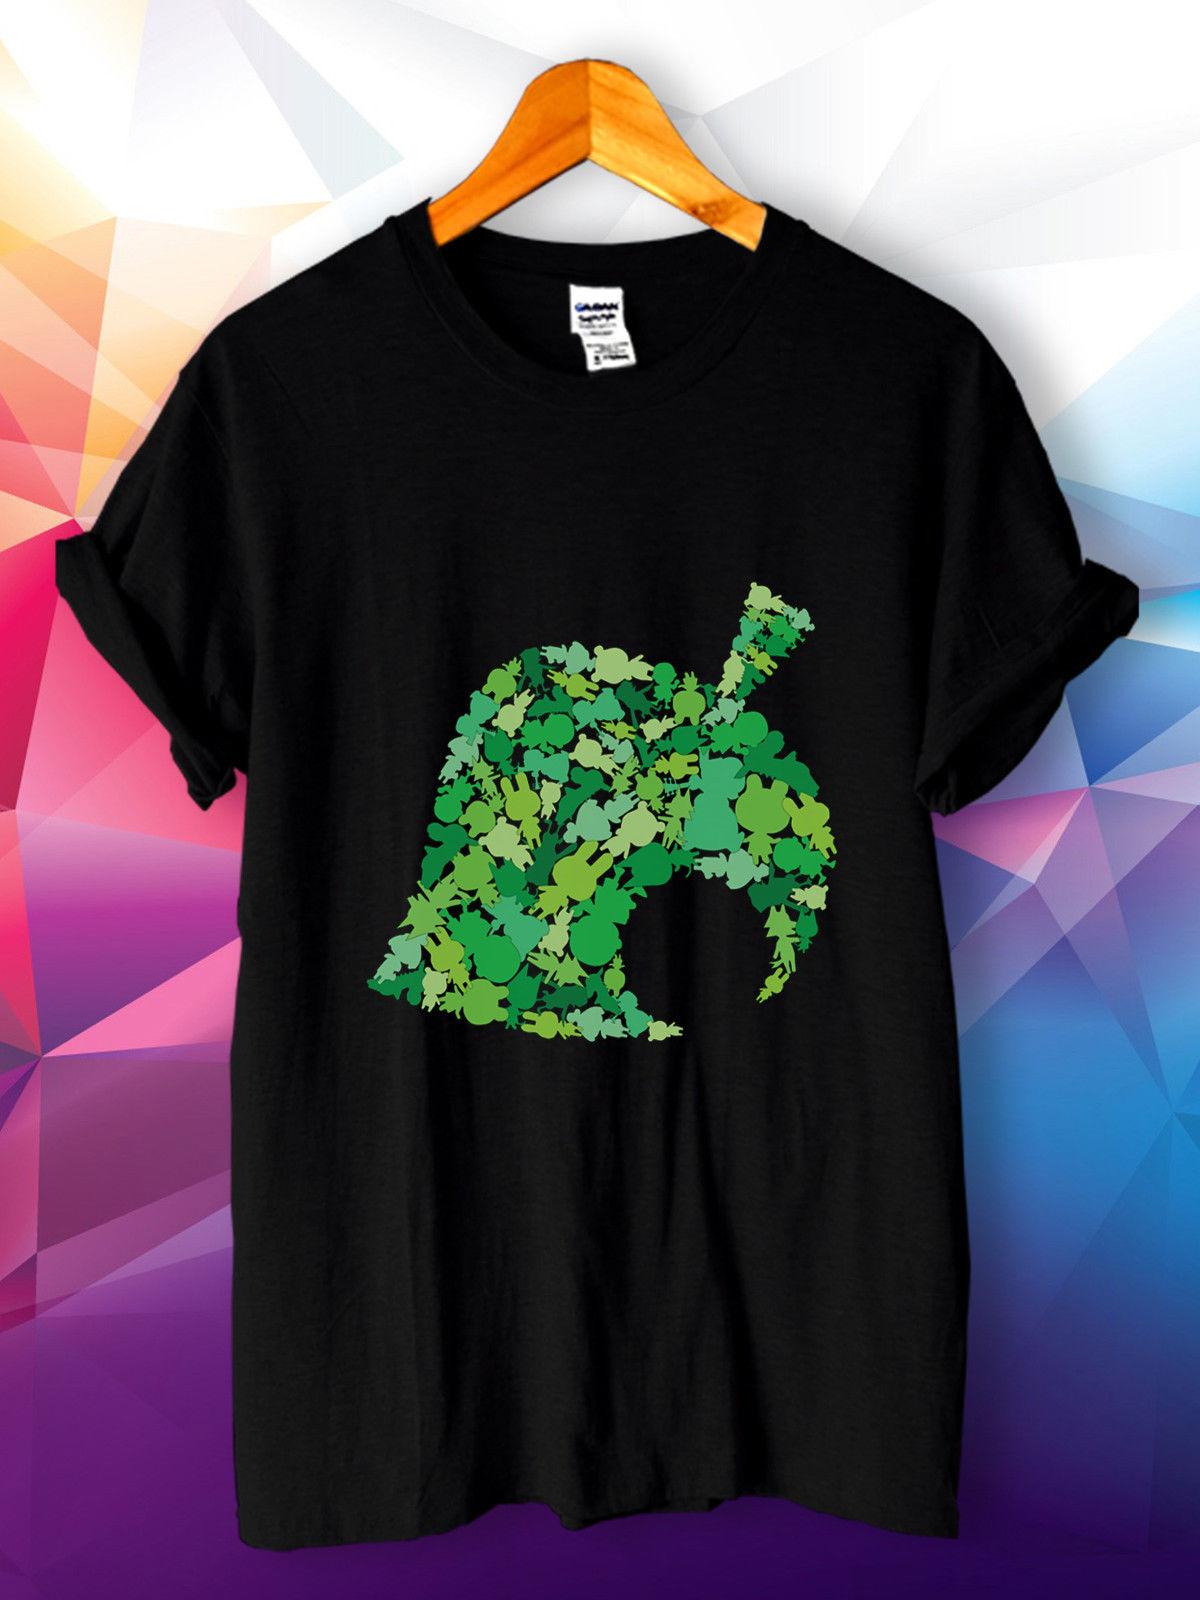 Animal Crossing новый лист логотип Gamer Новый Street Wear Повседневное футболка S, M, L, XL, 2XL ...